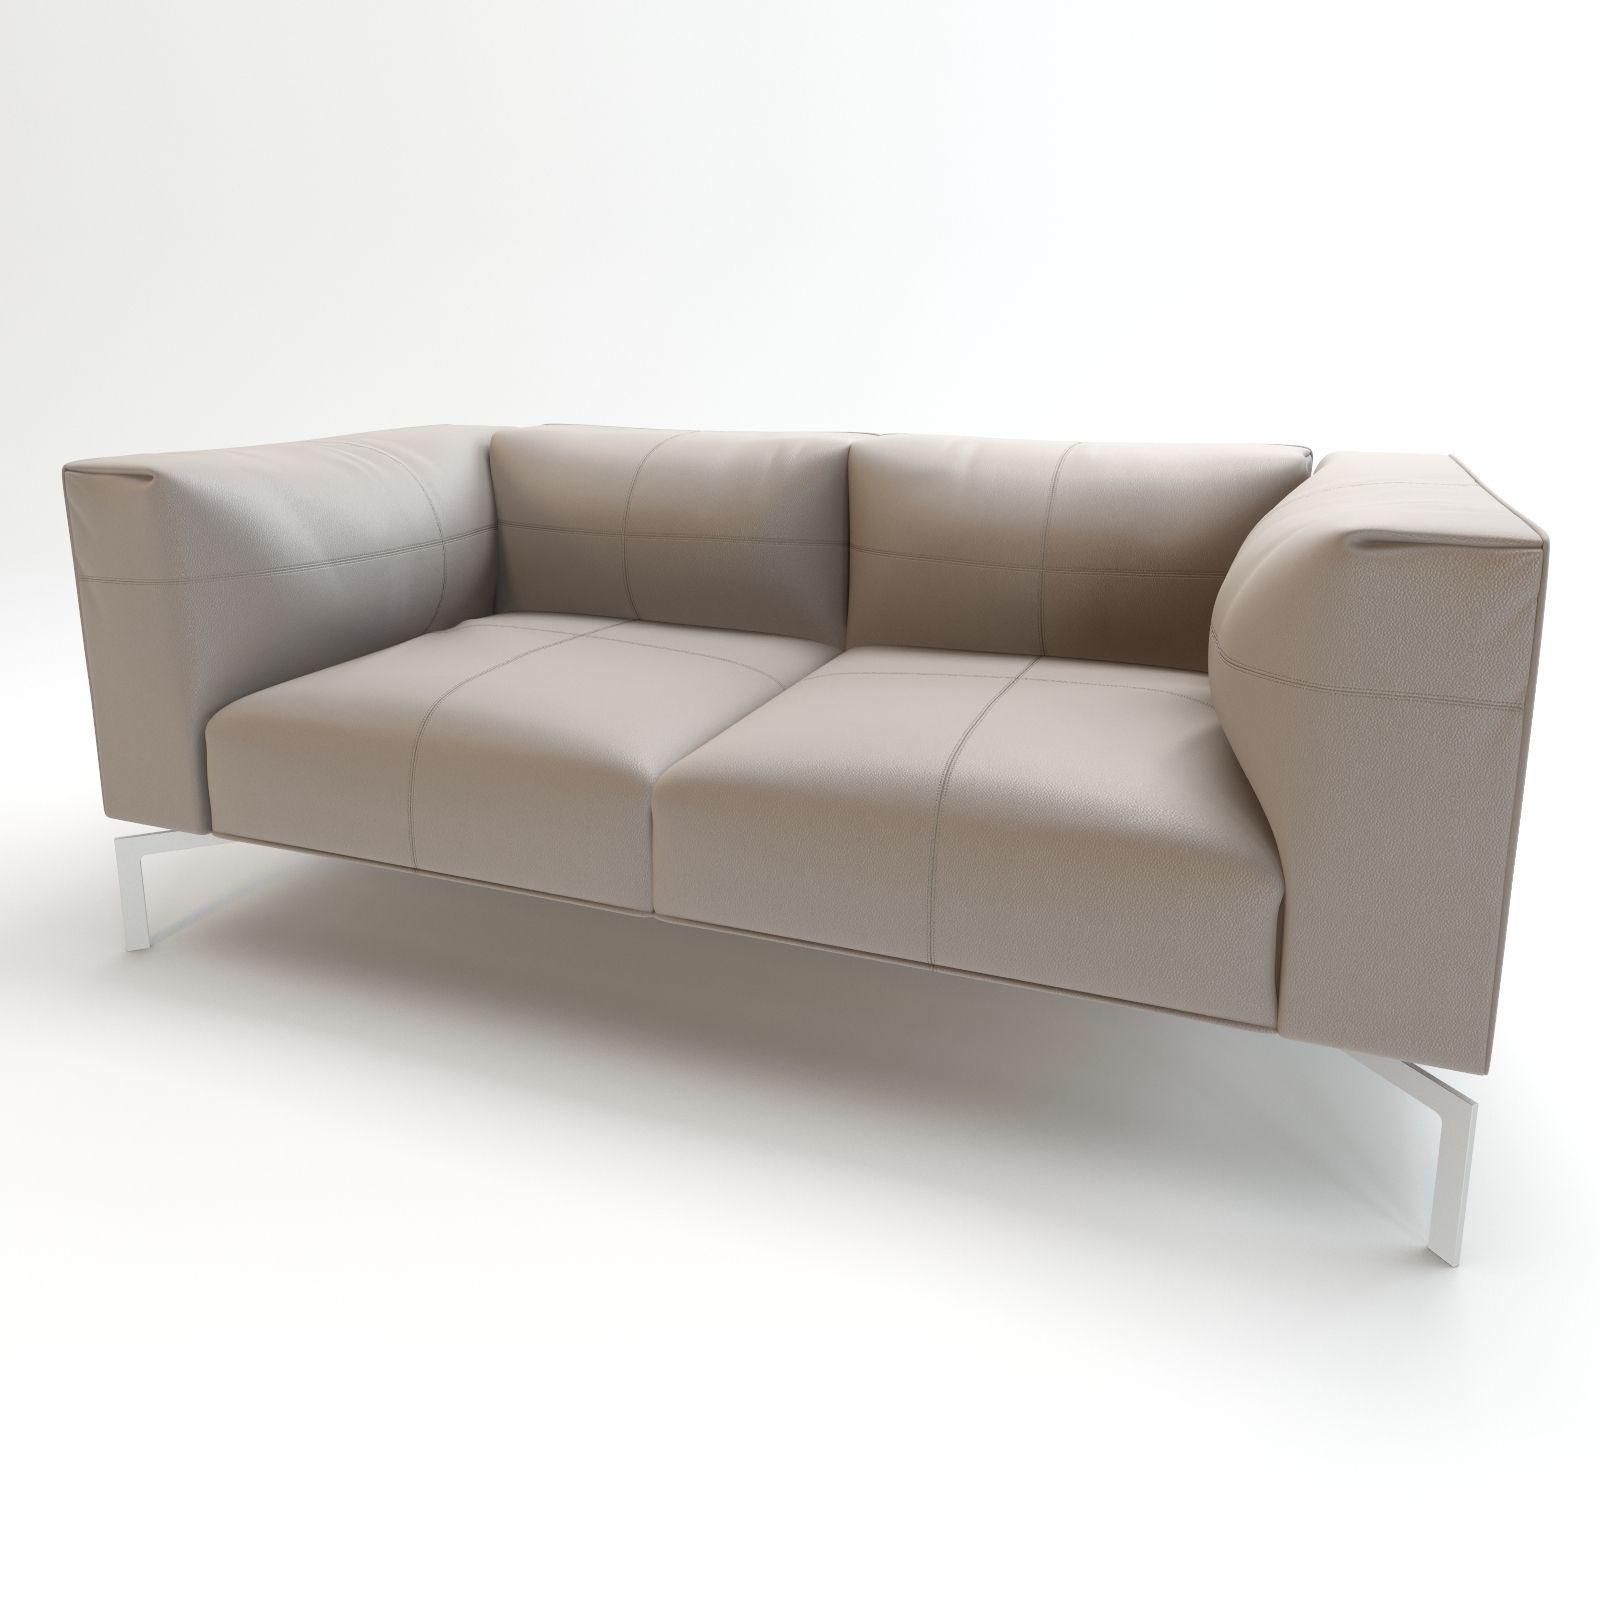 ... Leather Sofa Poltrona Frau 3d Model Max Obj Mtl Fbx ...